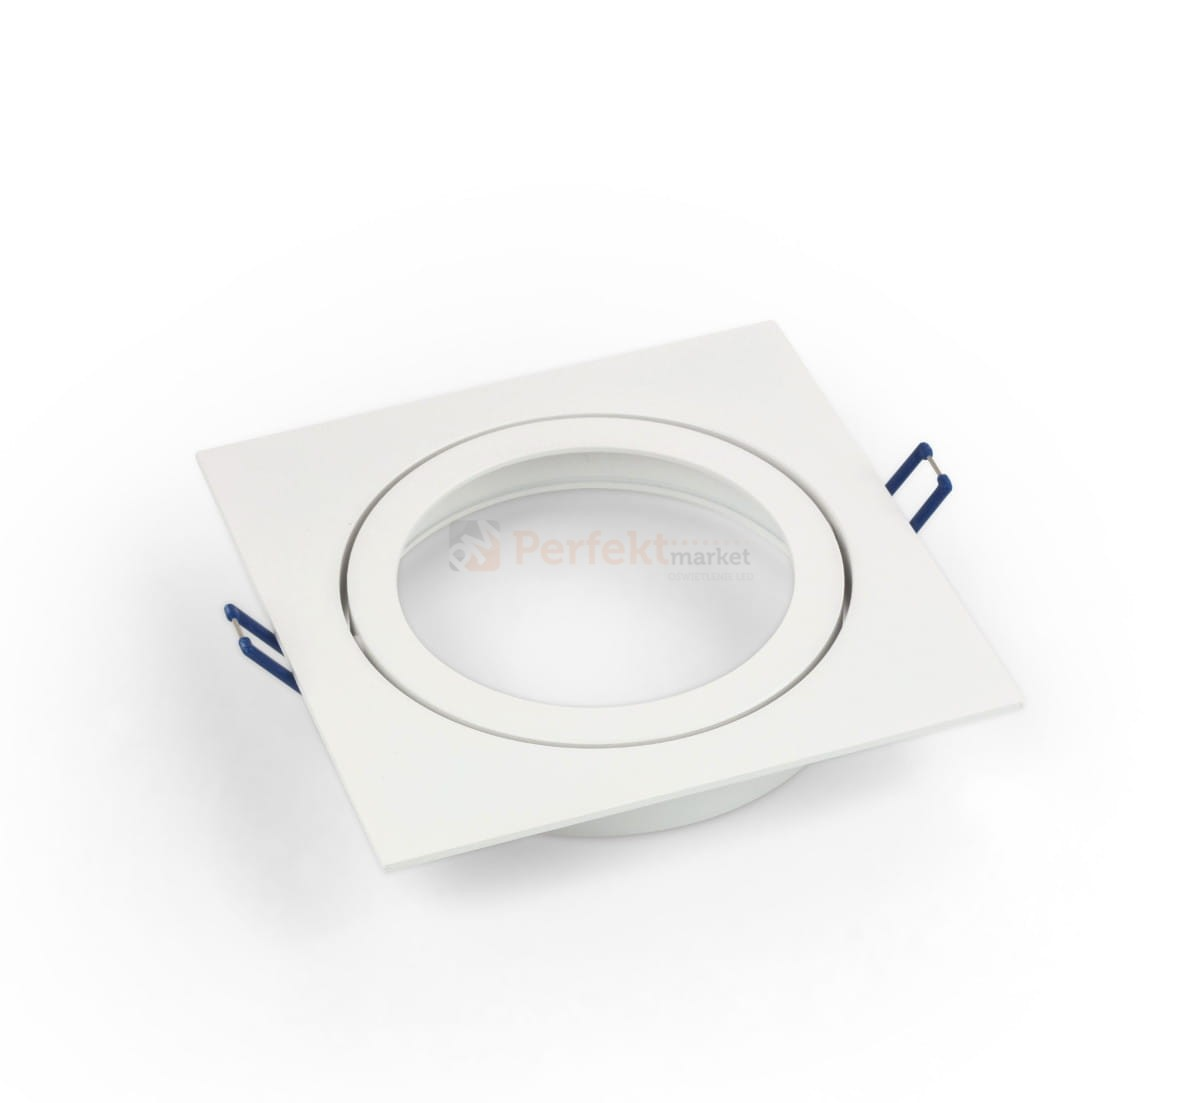 Oprawa Halogenowa Ruchoma Crosti Gavi Ar111 Kwadratowa Biała